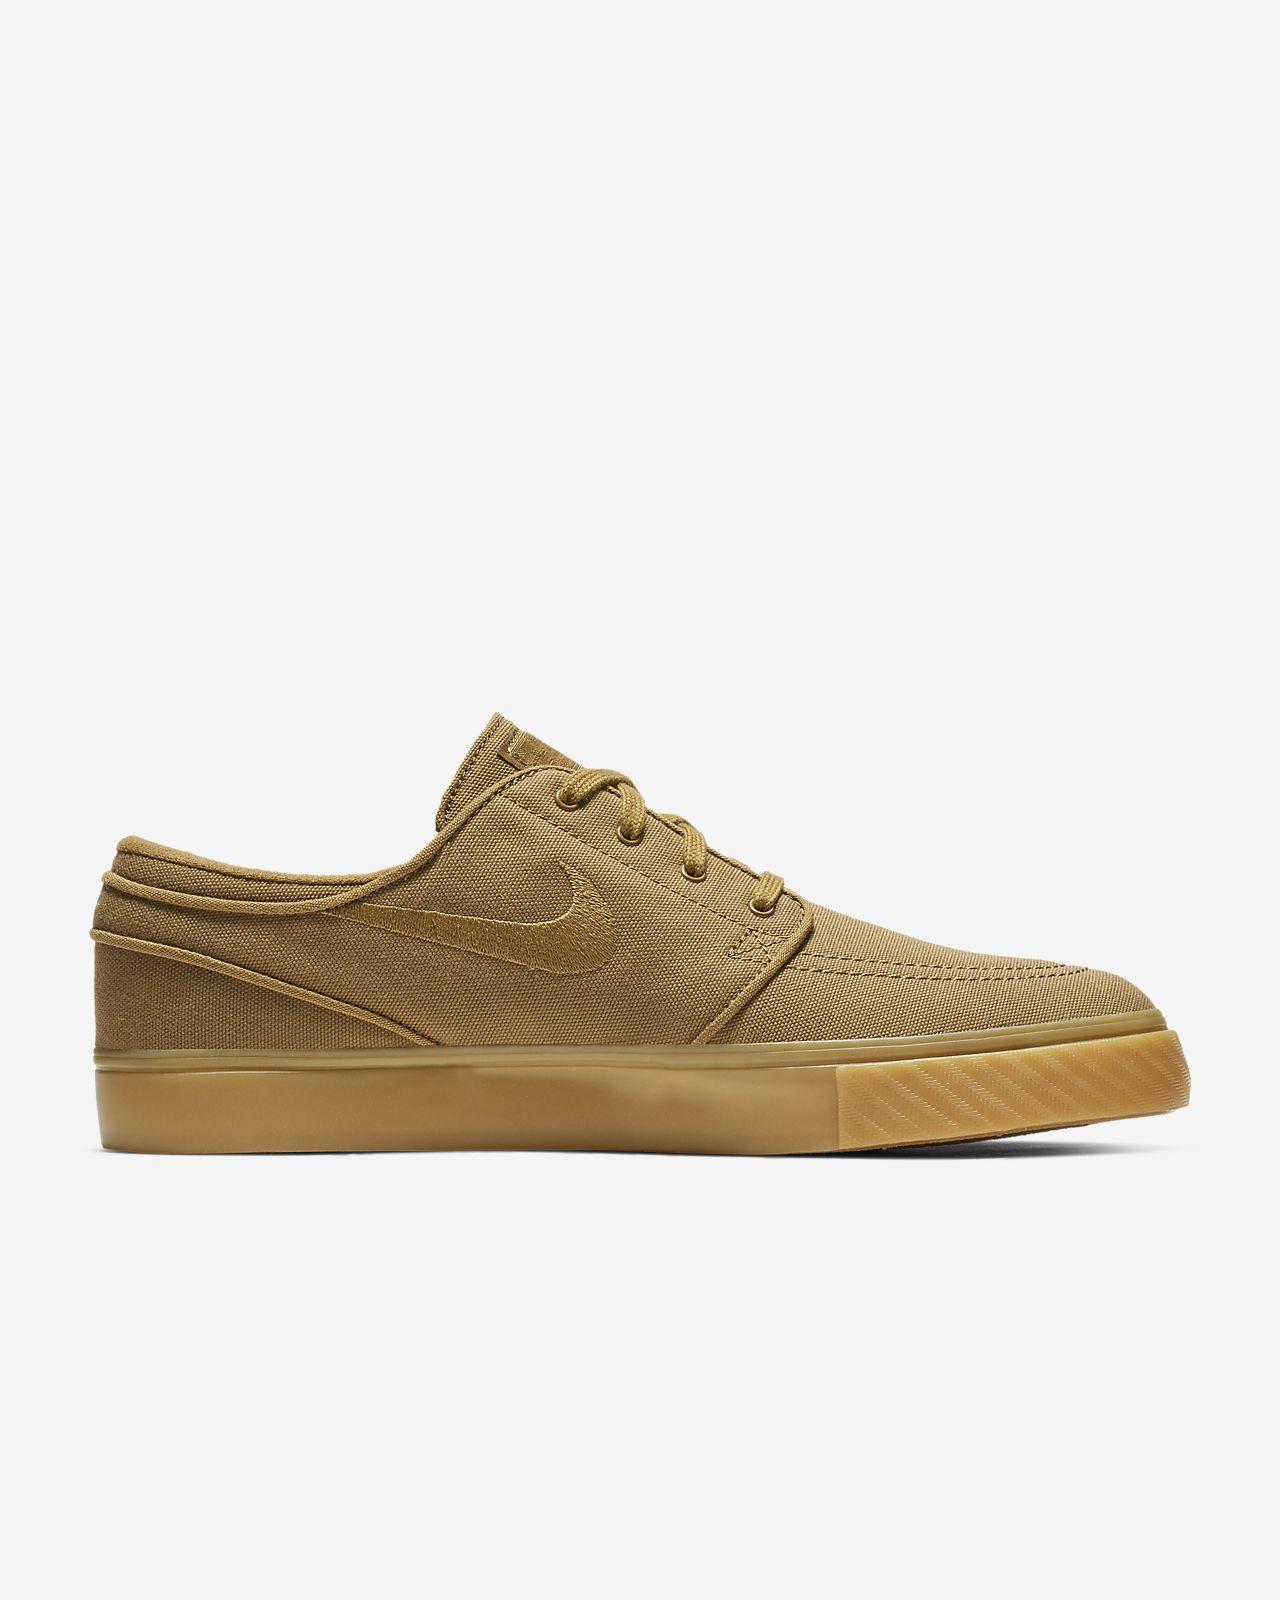 buy online 76b9f abe2d ... Nike SB Zoom Stefan Janoski Canvas Men s Skate Shoe